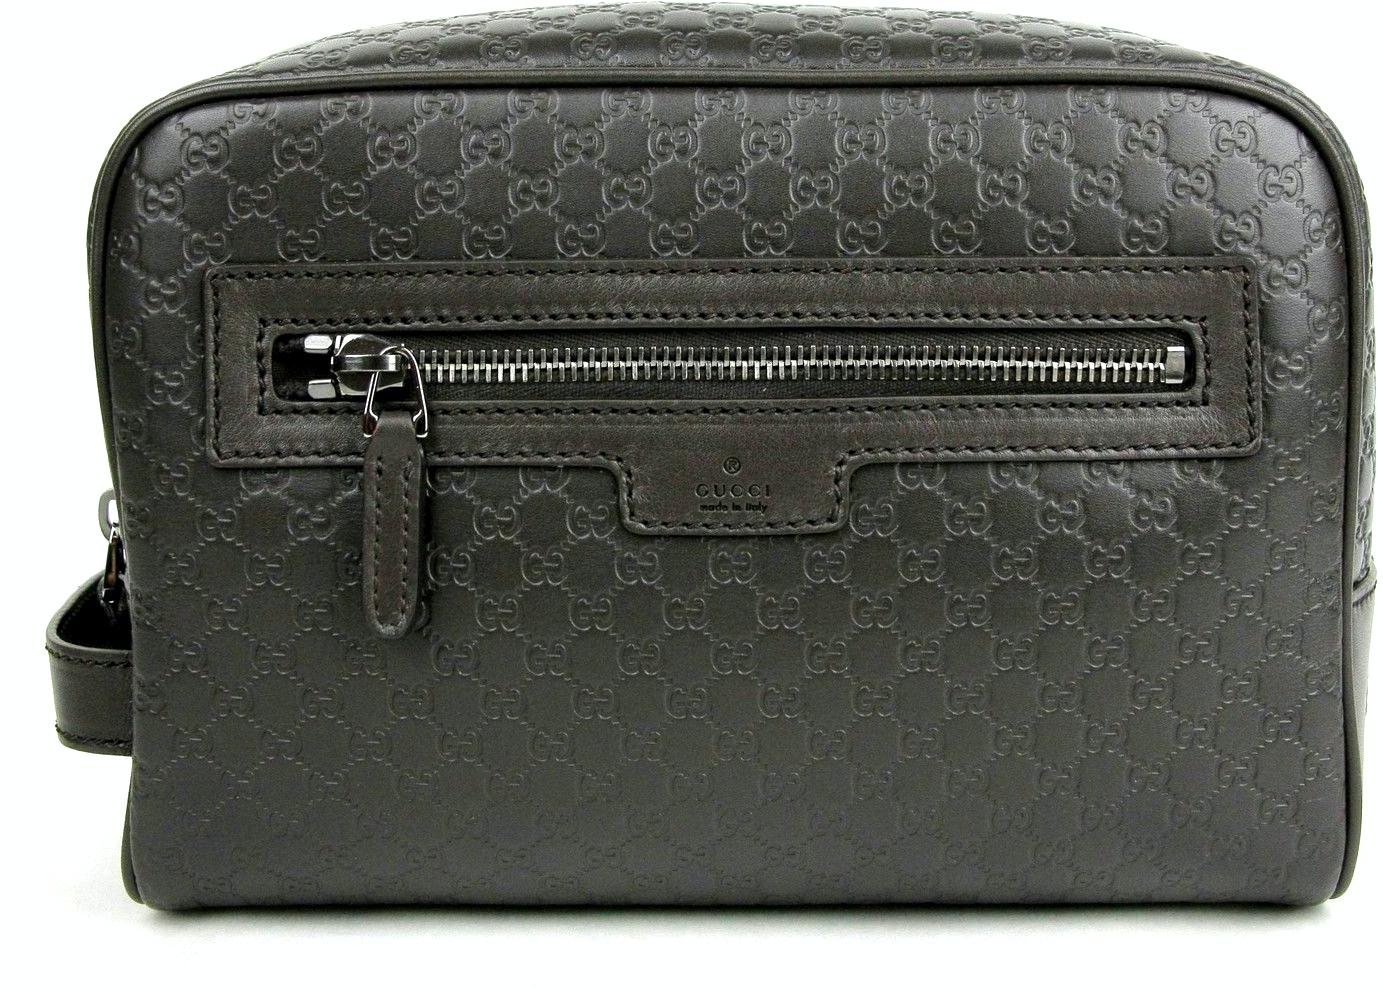 Gucci Zip Top Toiletry Bag Monogram Guccissima Brown